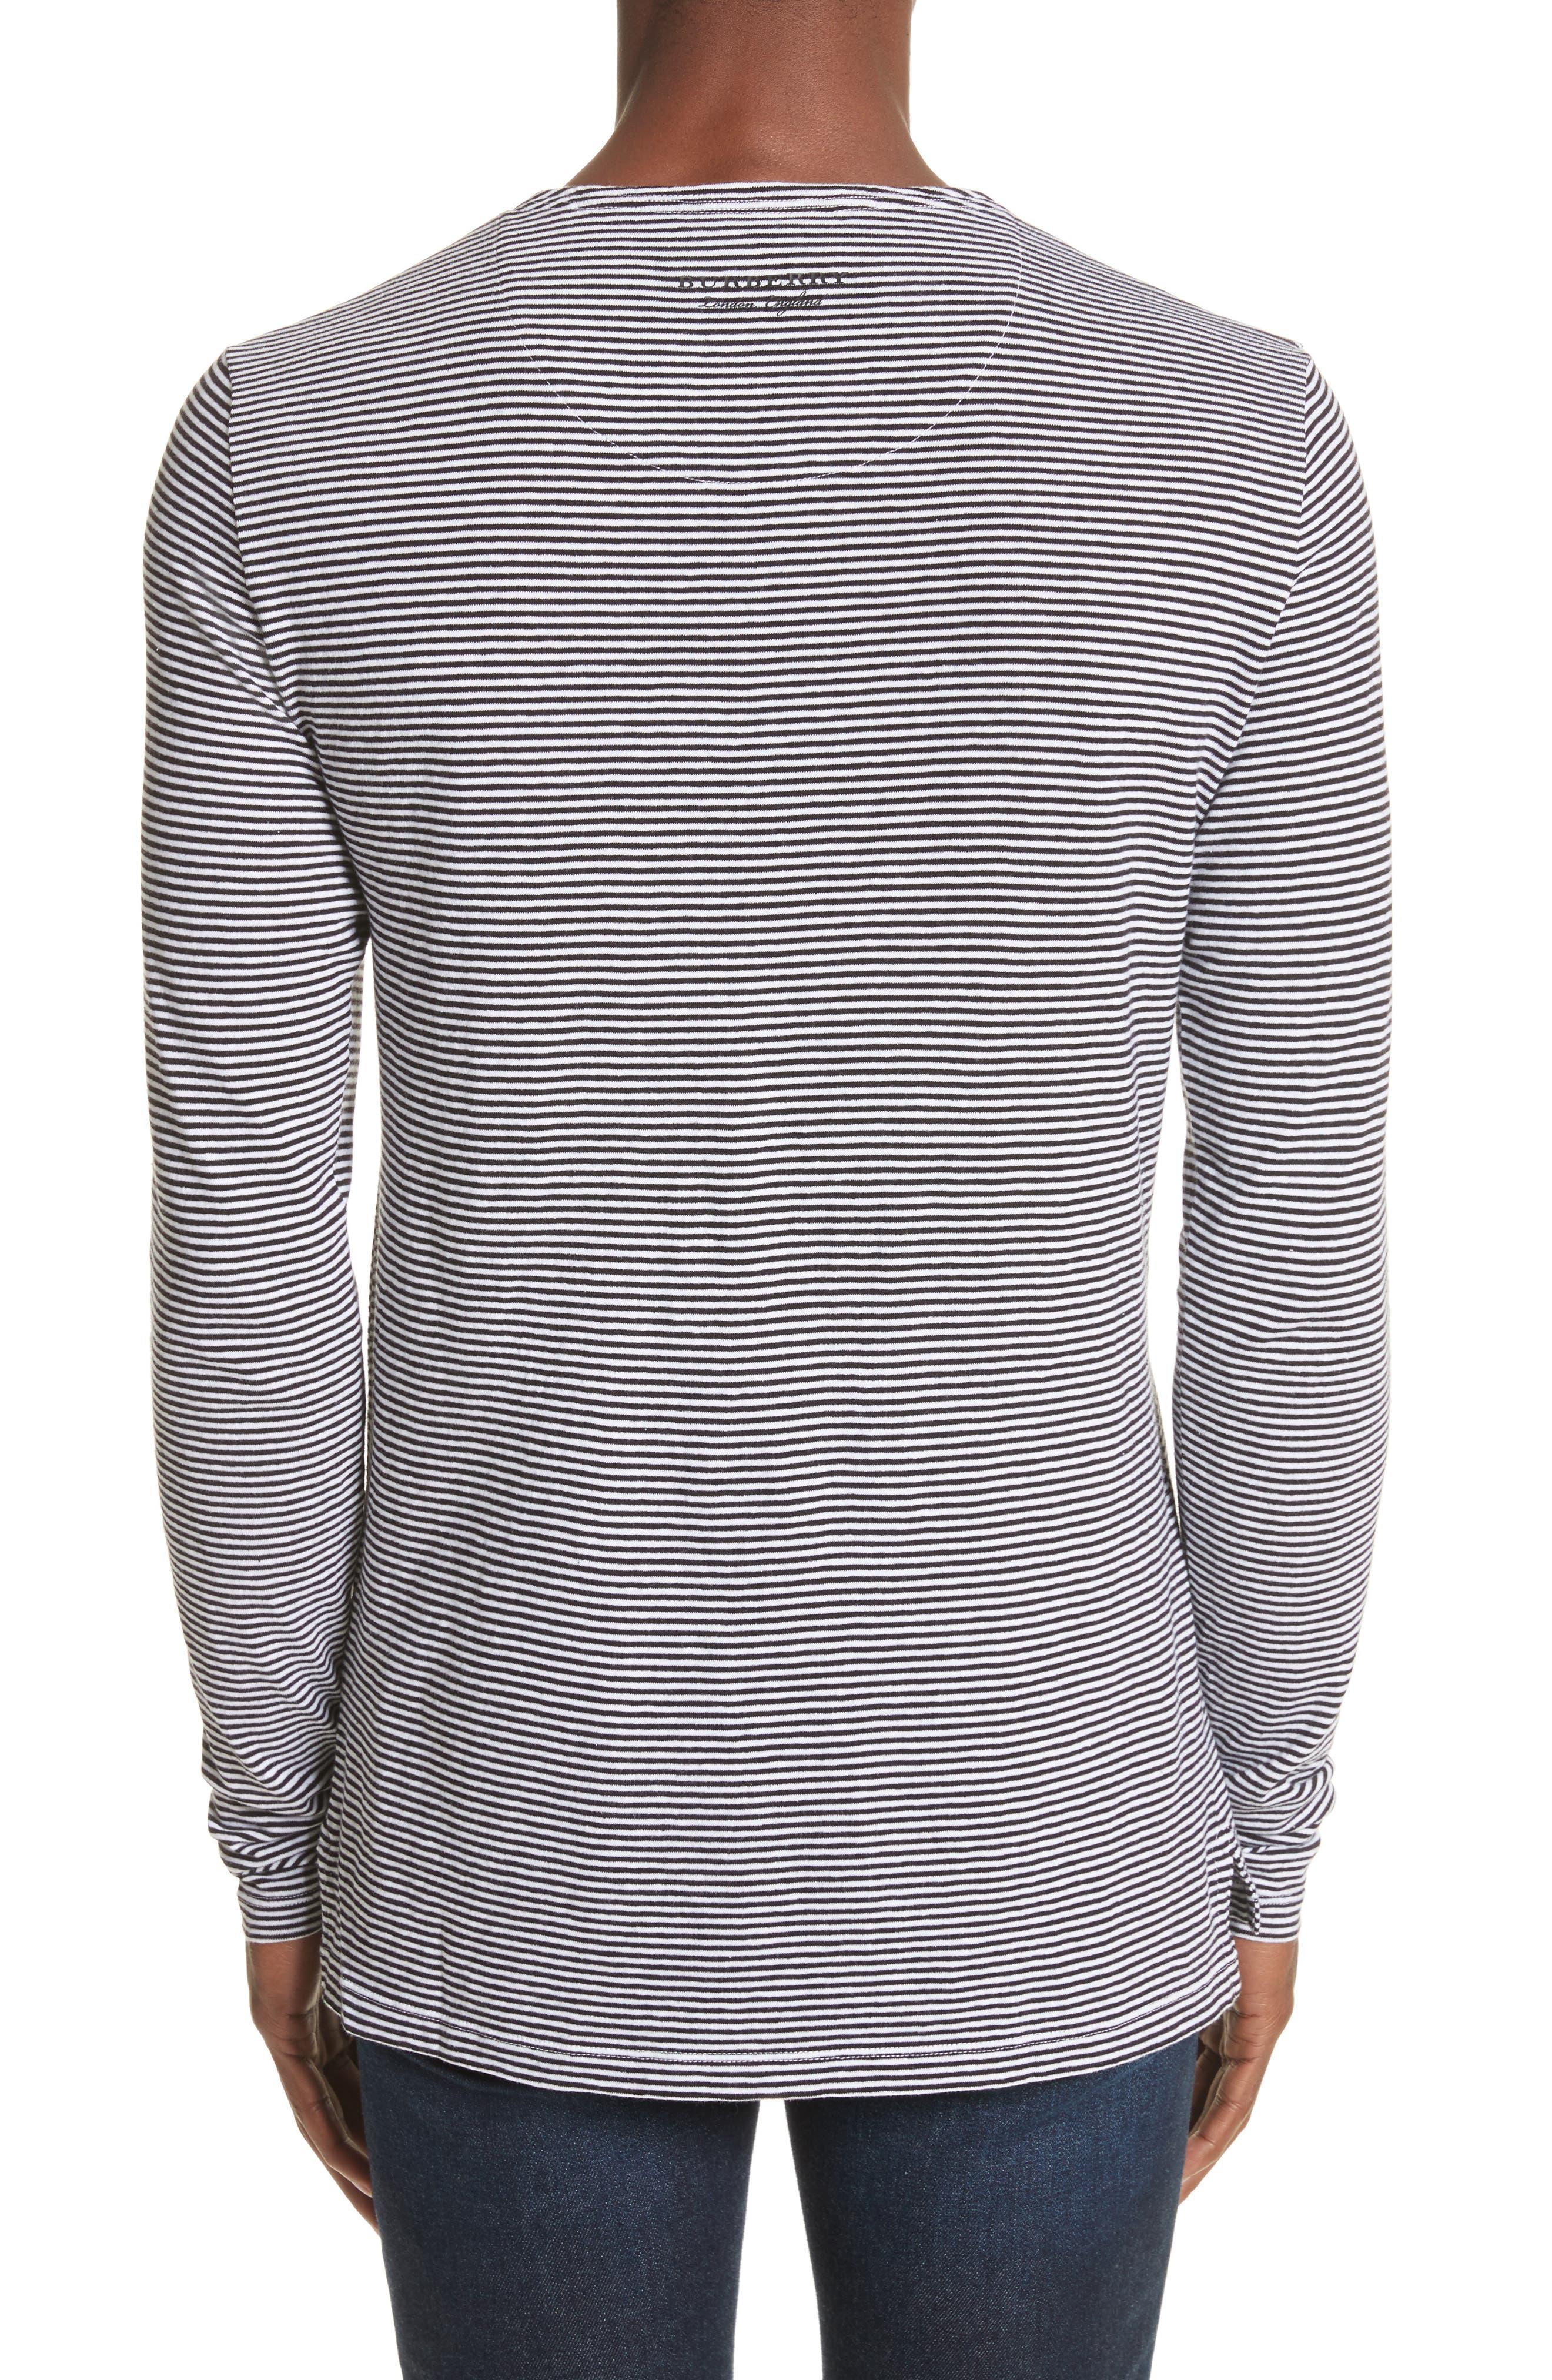 Tayford Stripe Long Sleeve T-Shirt,                             Alternate thumbnail 2, color,                             100